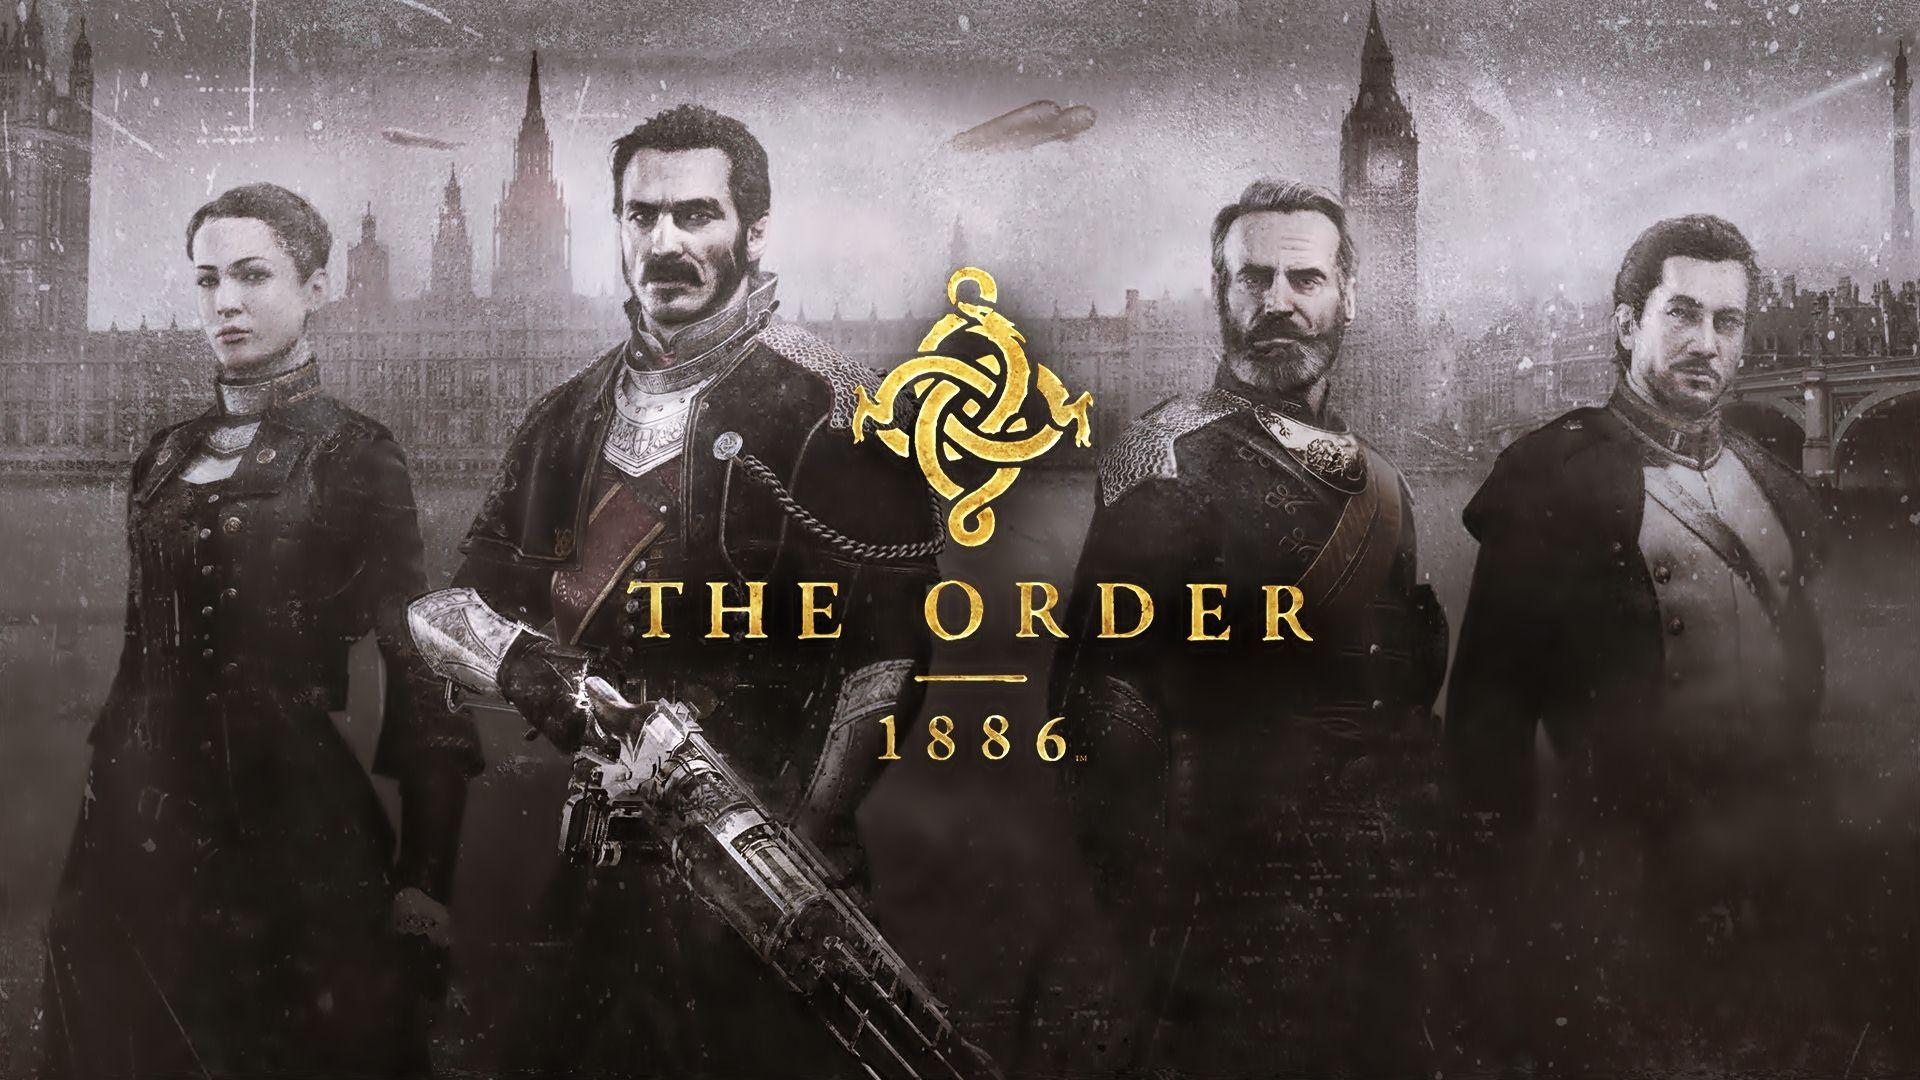 Facebook купил студию Ready atDawn, которая создала игру The Order: 1886